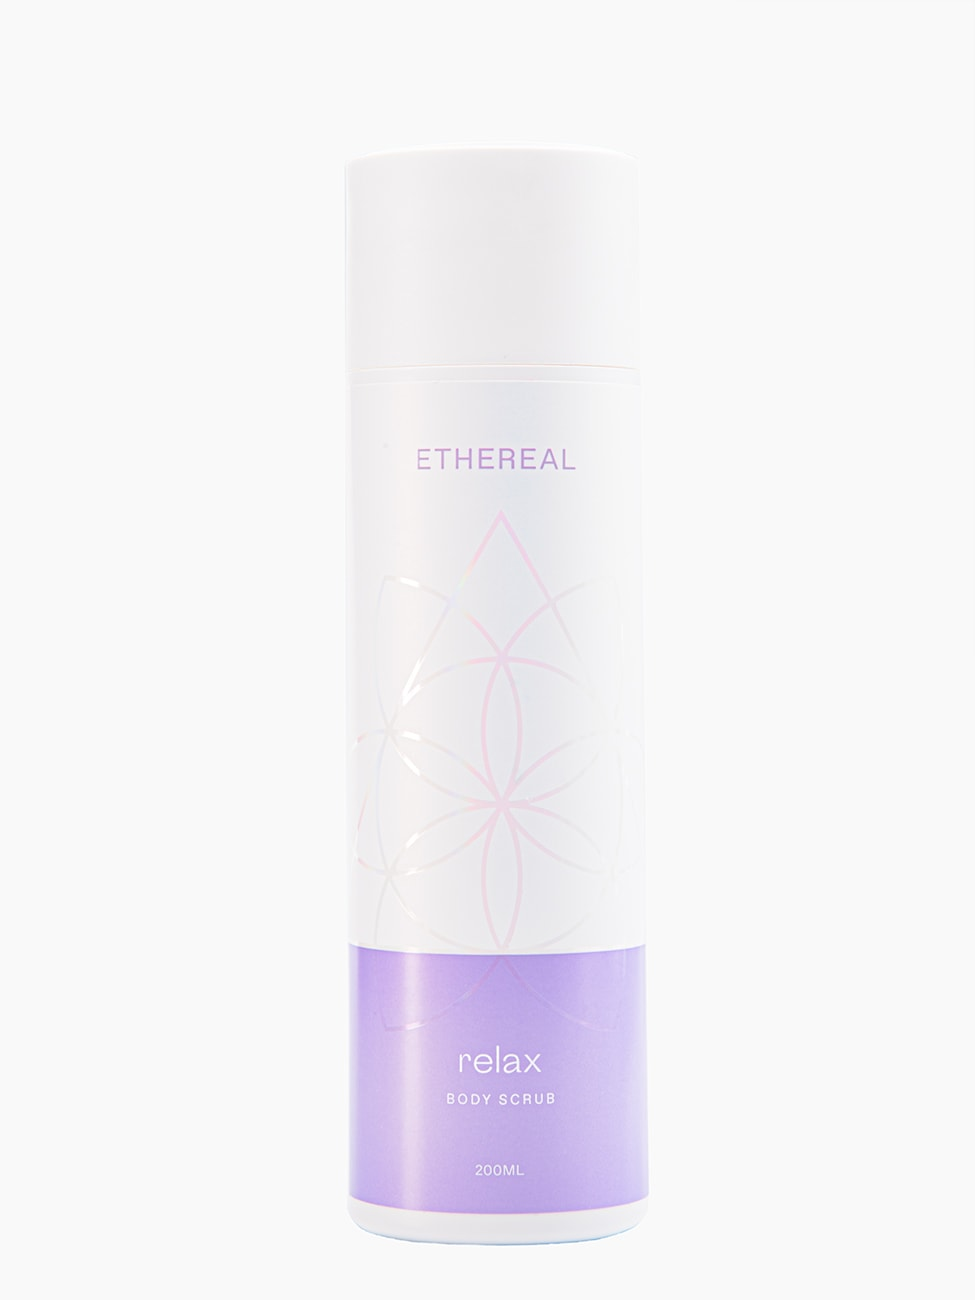 Relax_Body_Scrub_Ethereal_Dermocosmetics_Skincare_Handmade_Greek_Products